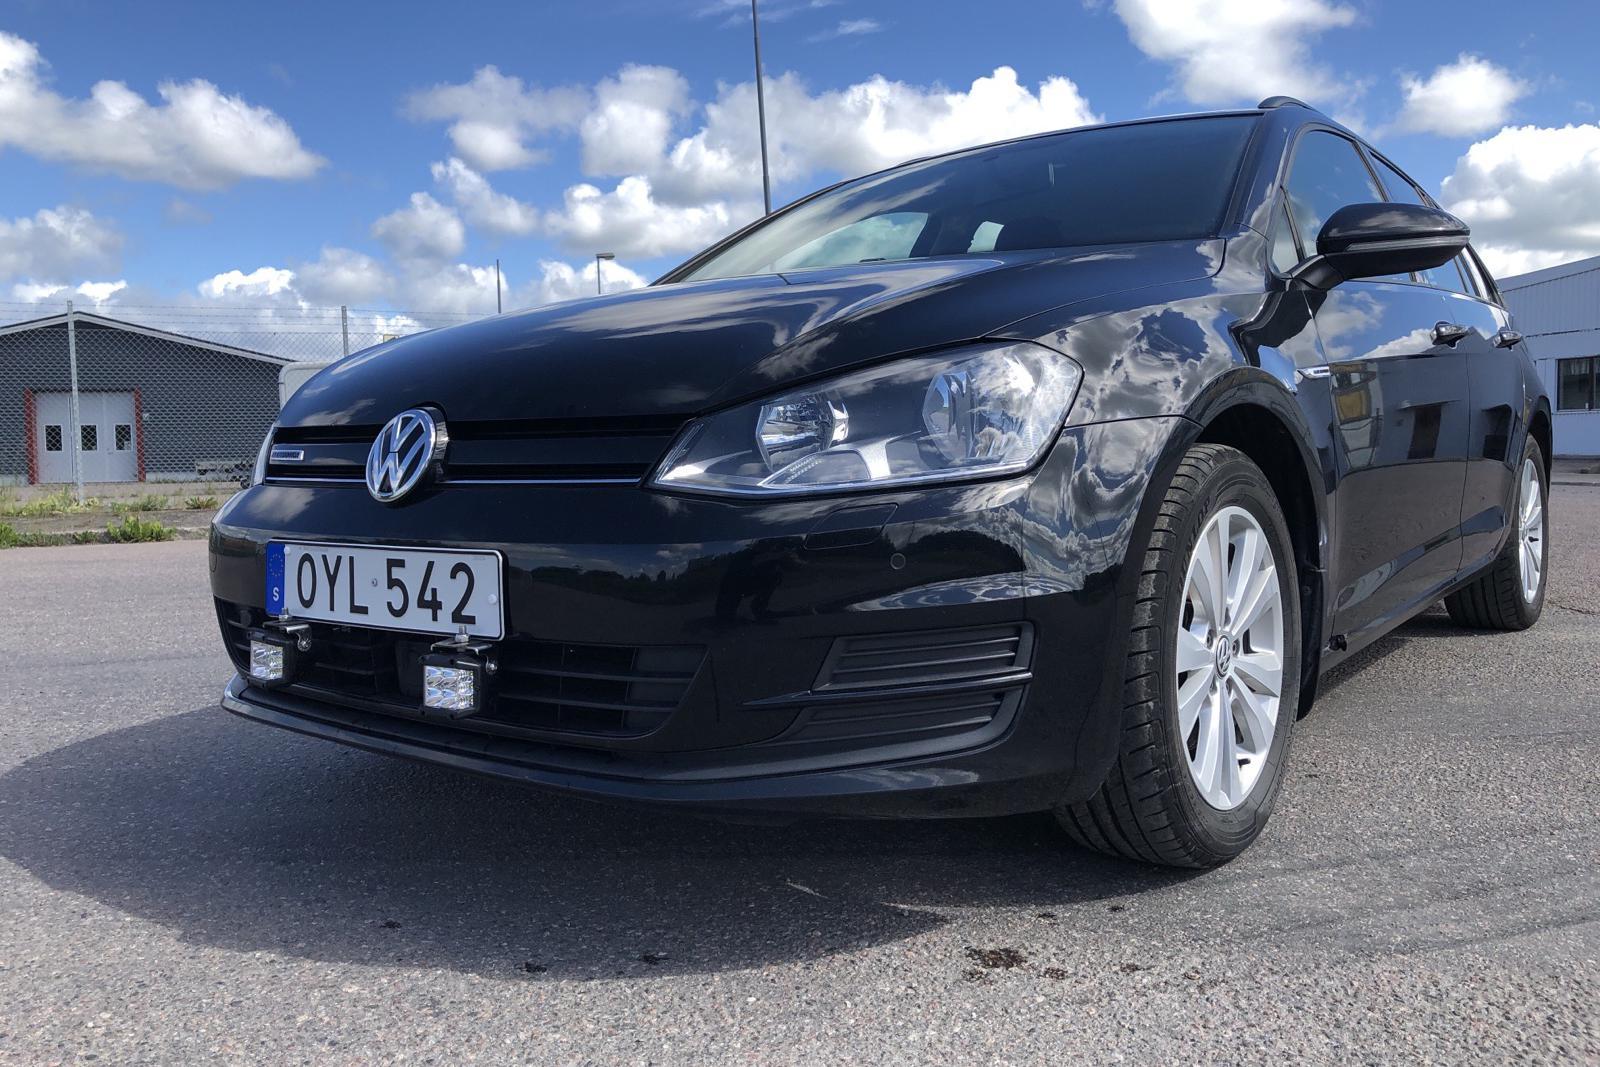 VW Golf VII 1.4 TGI BlueMotion Sportscombi (110hk)